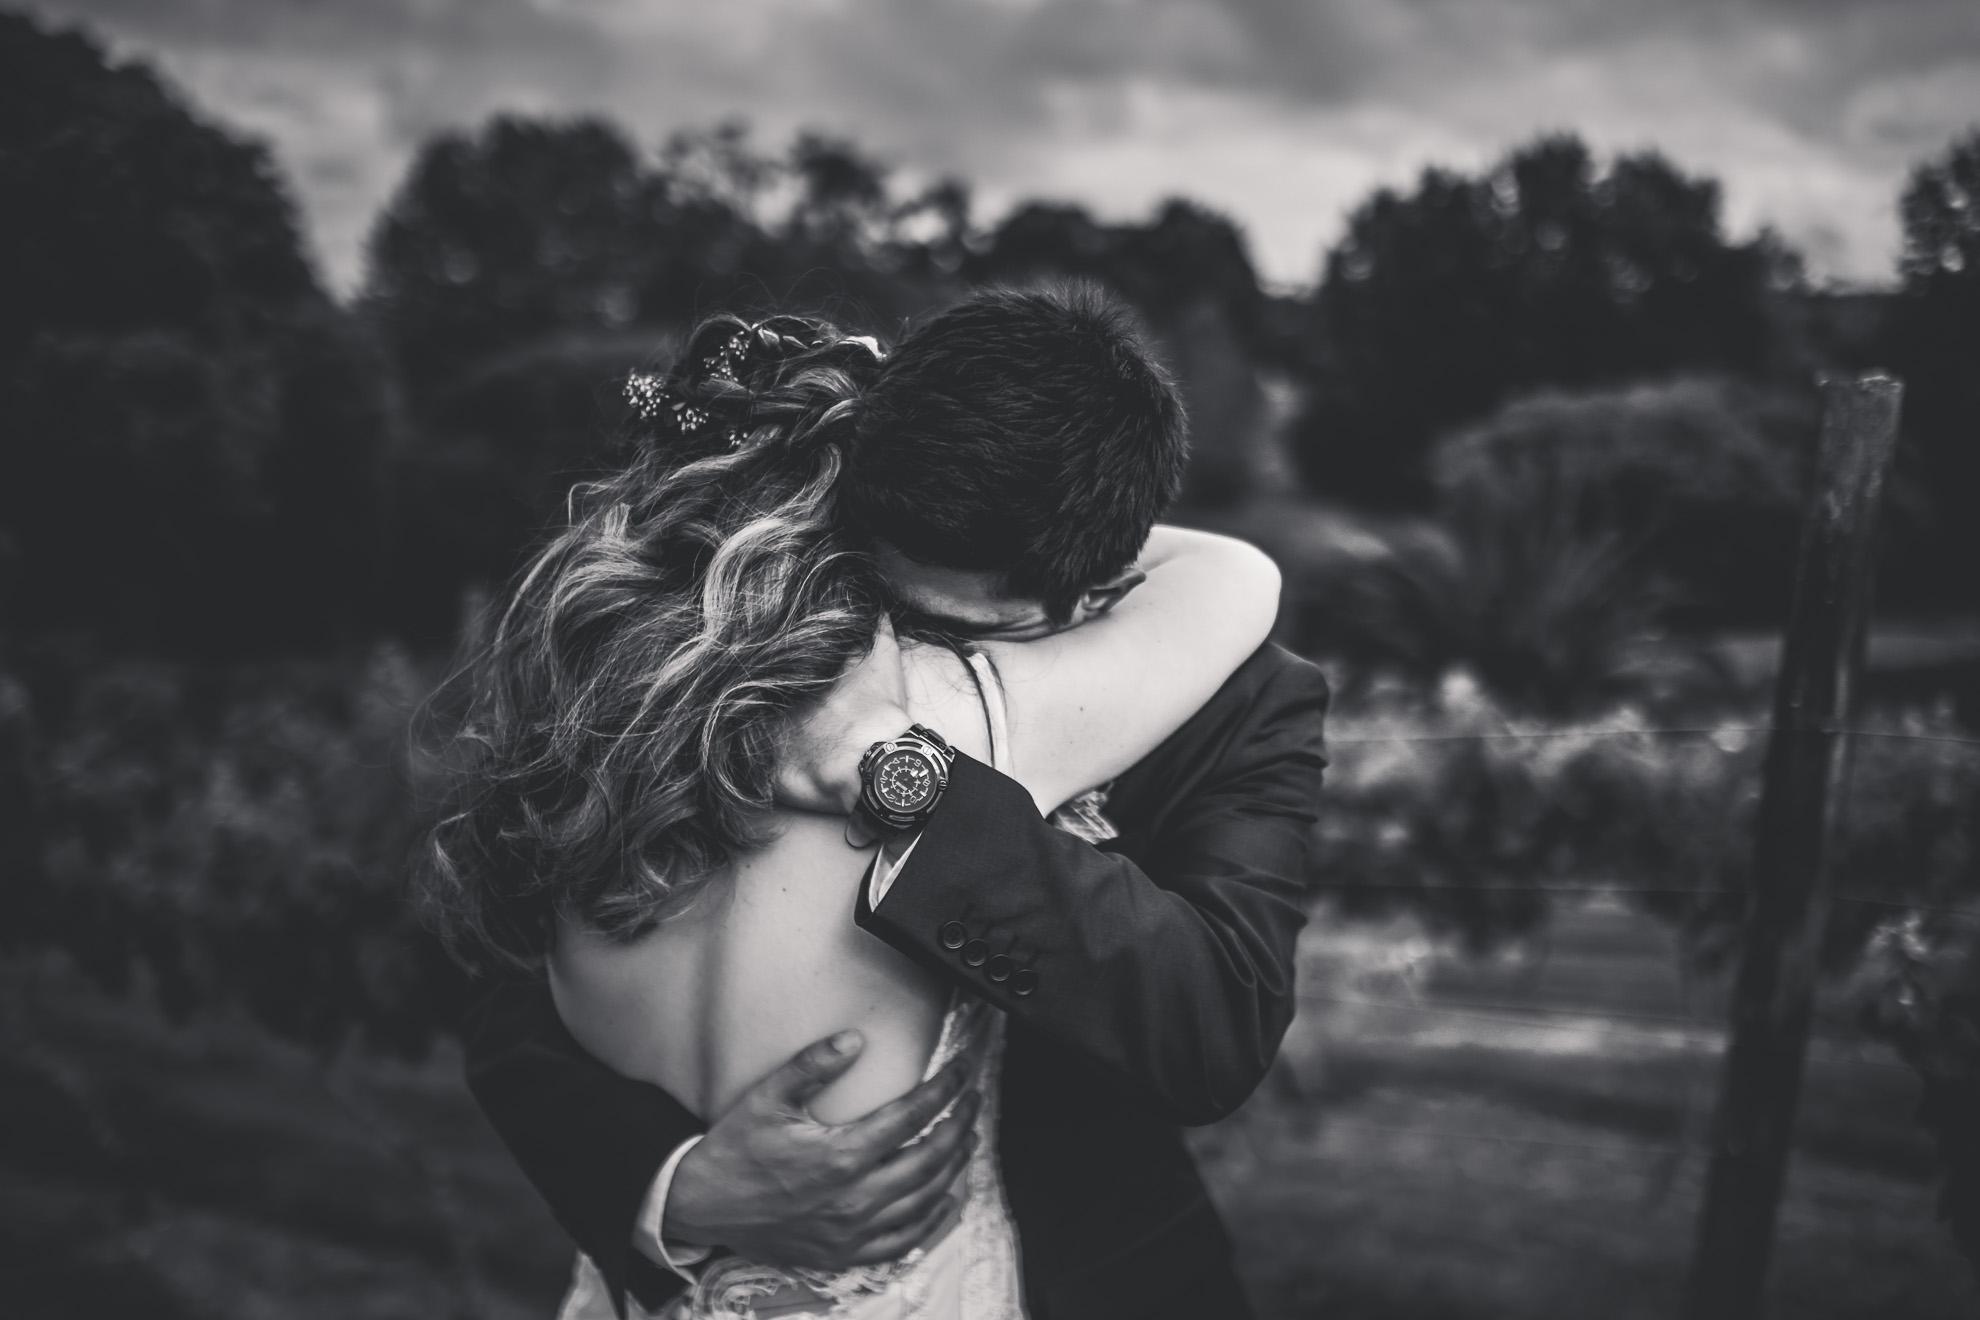 black and white emotional portrait